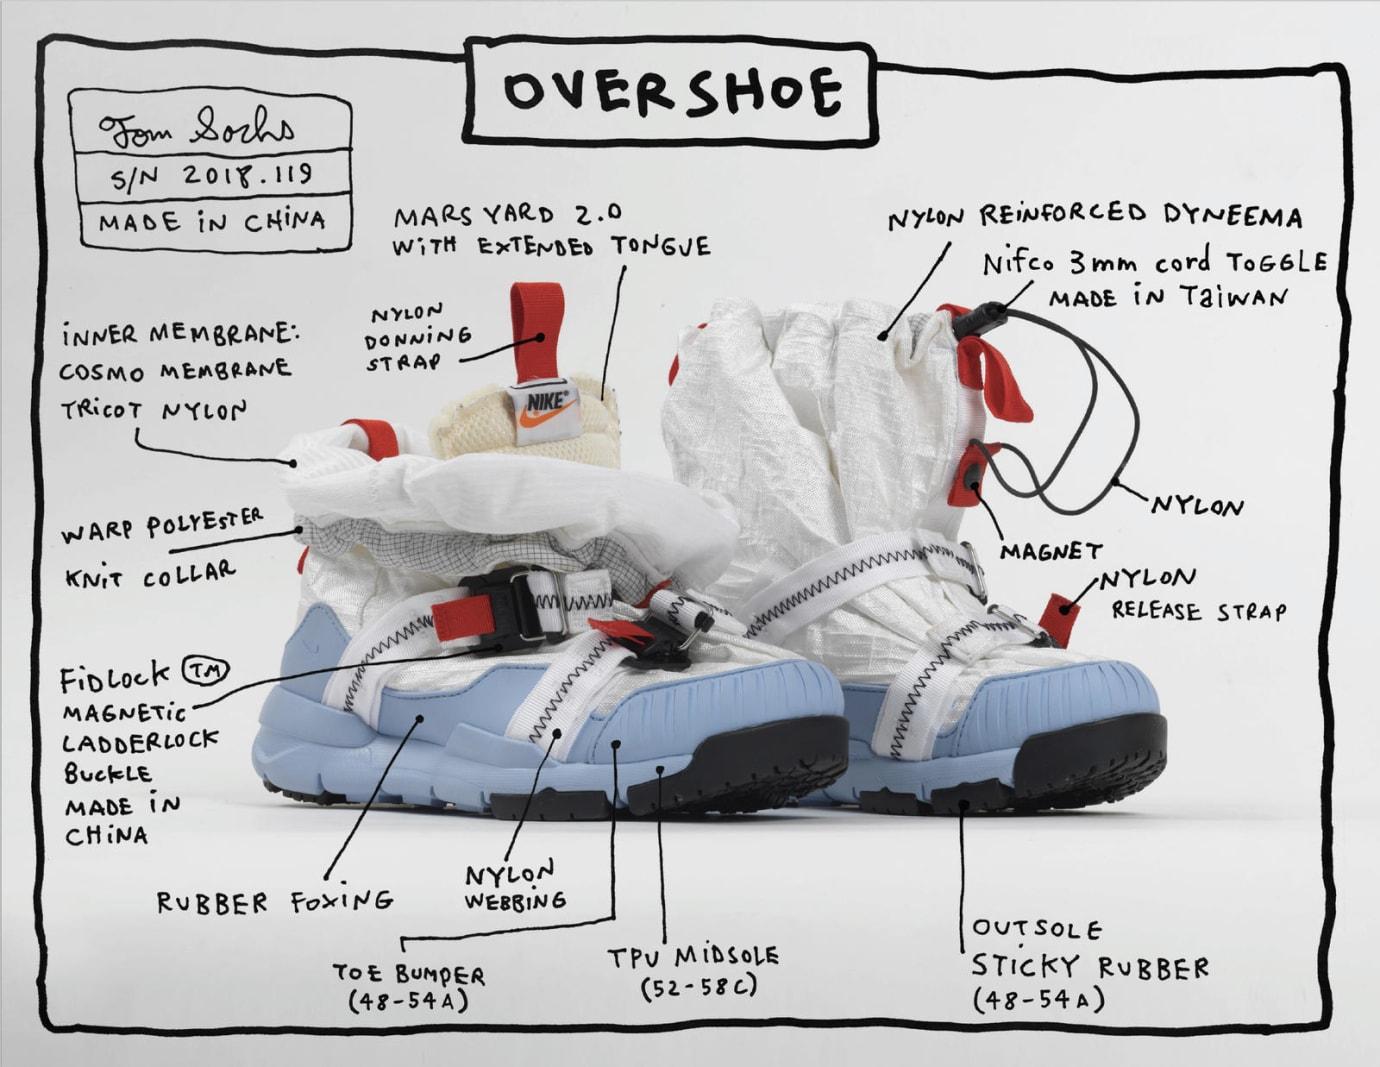 Tom Sachs x Nike Mars Yard Overshoe Specs